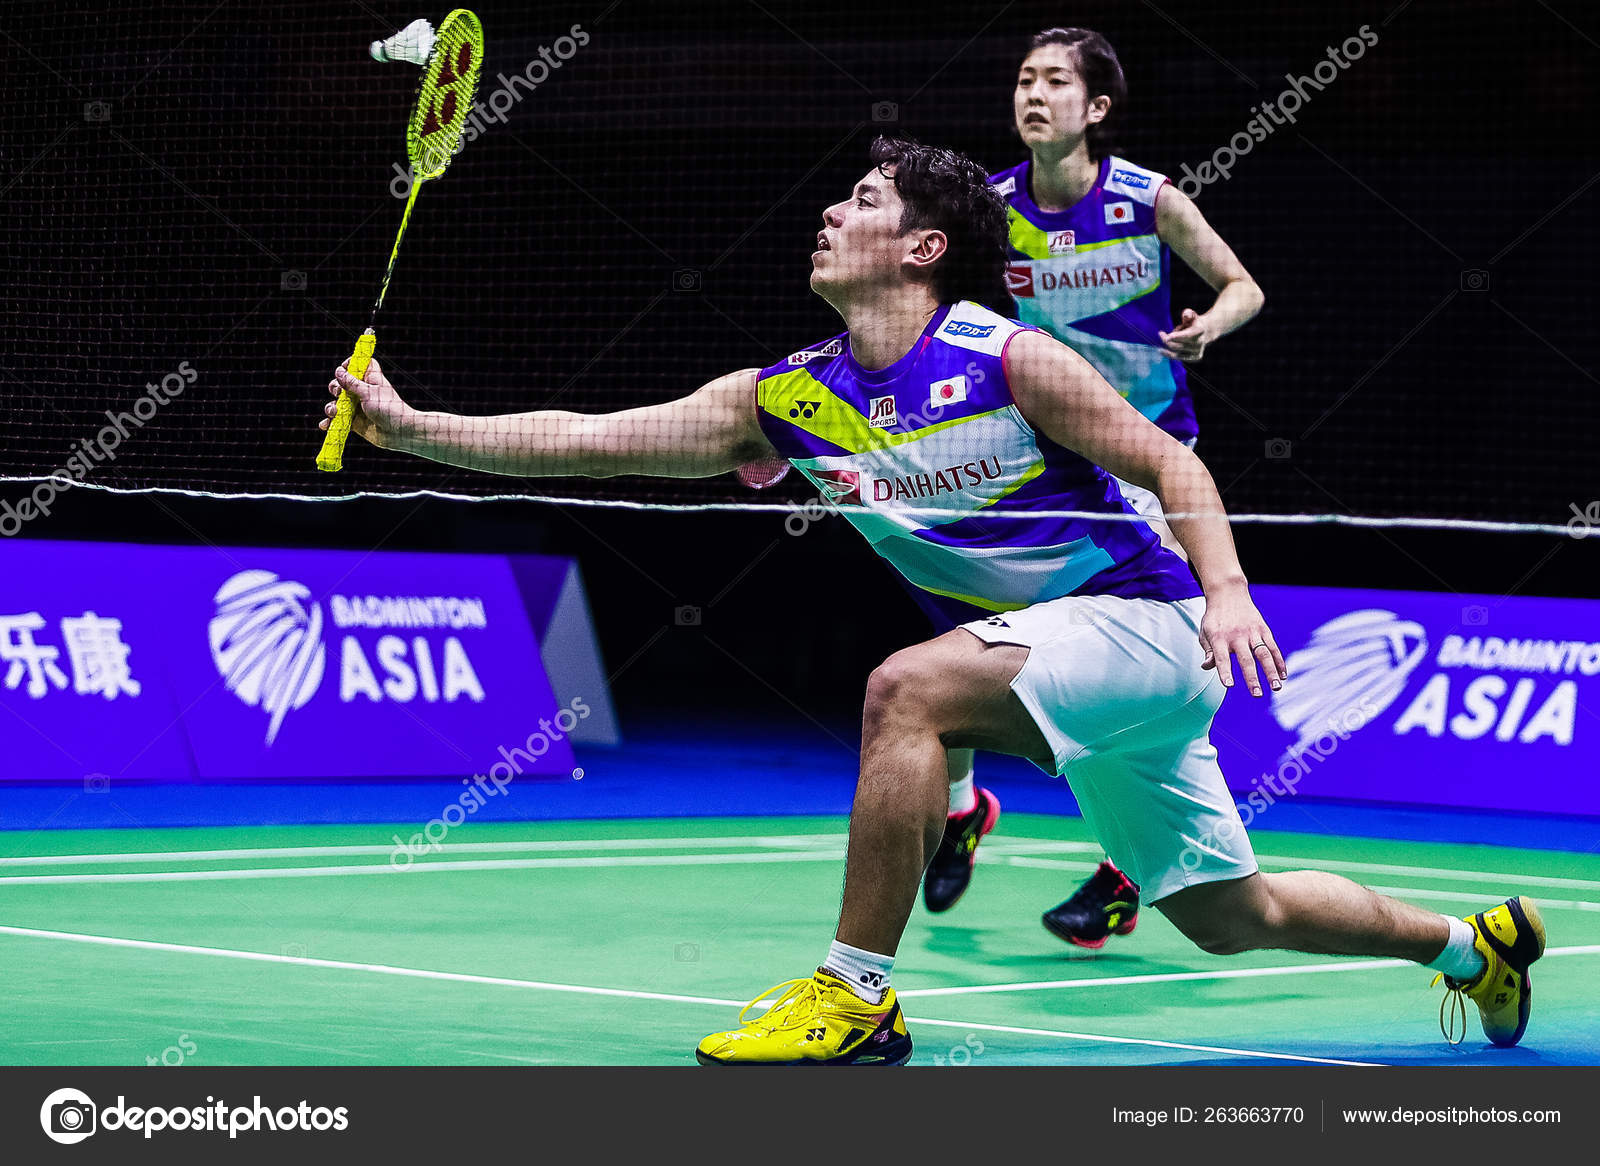 CHINA WUHAN 2019 BADMINTON ASIA CHAMPIONSHIPS – Stock